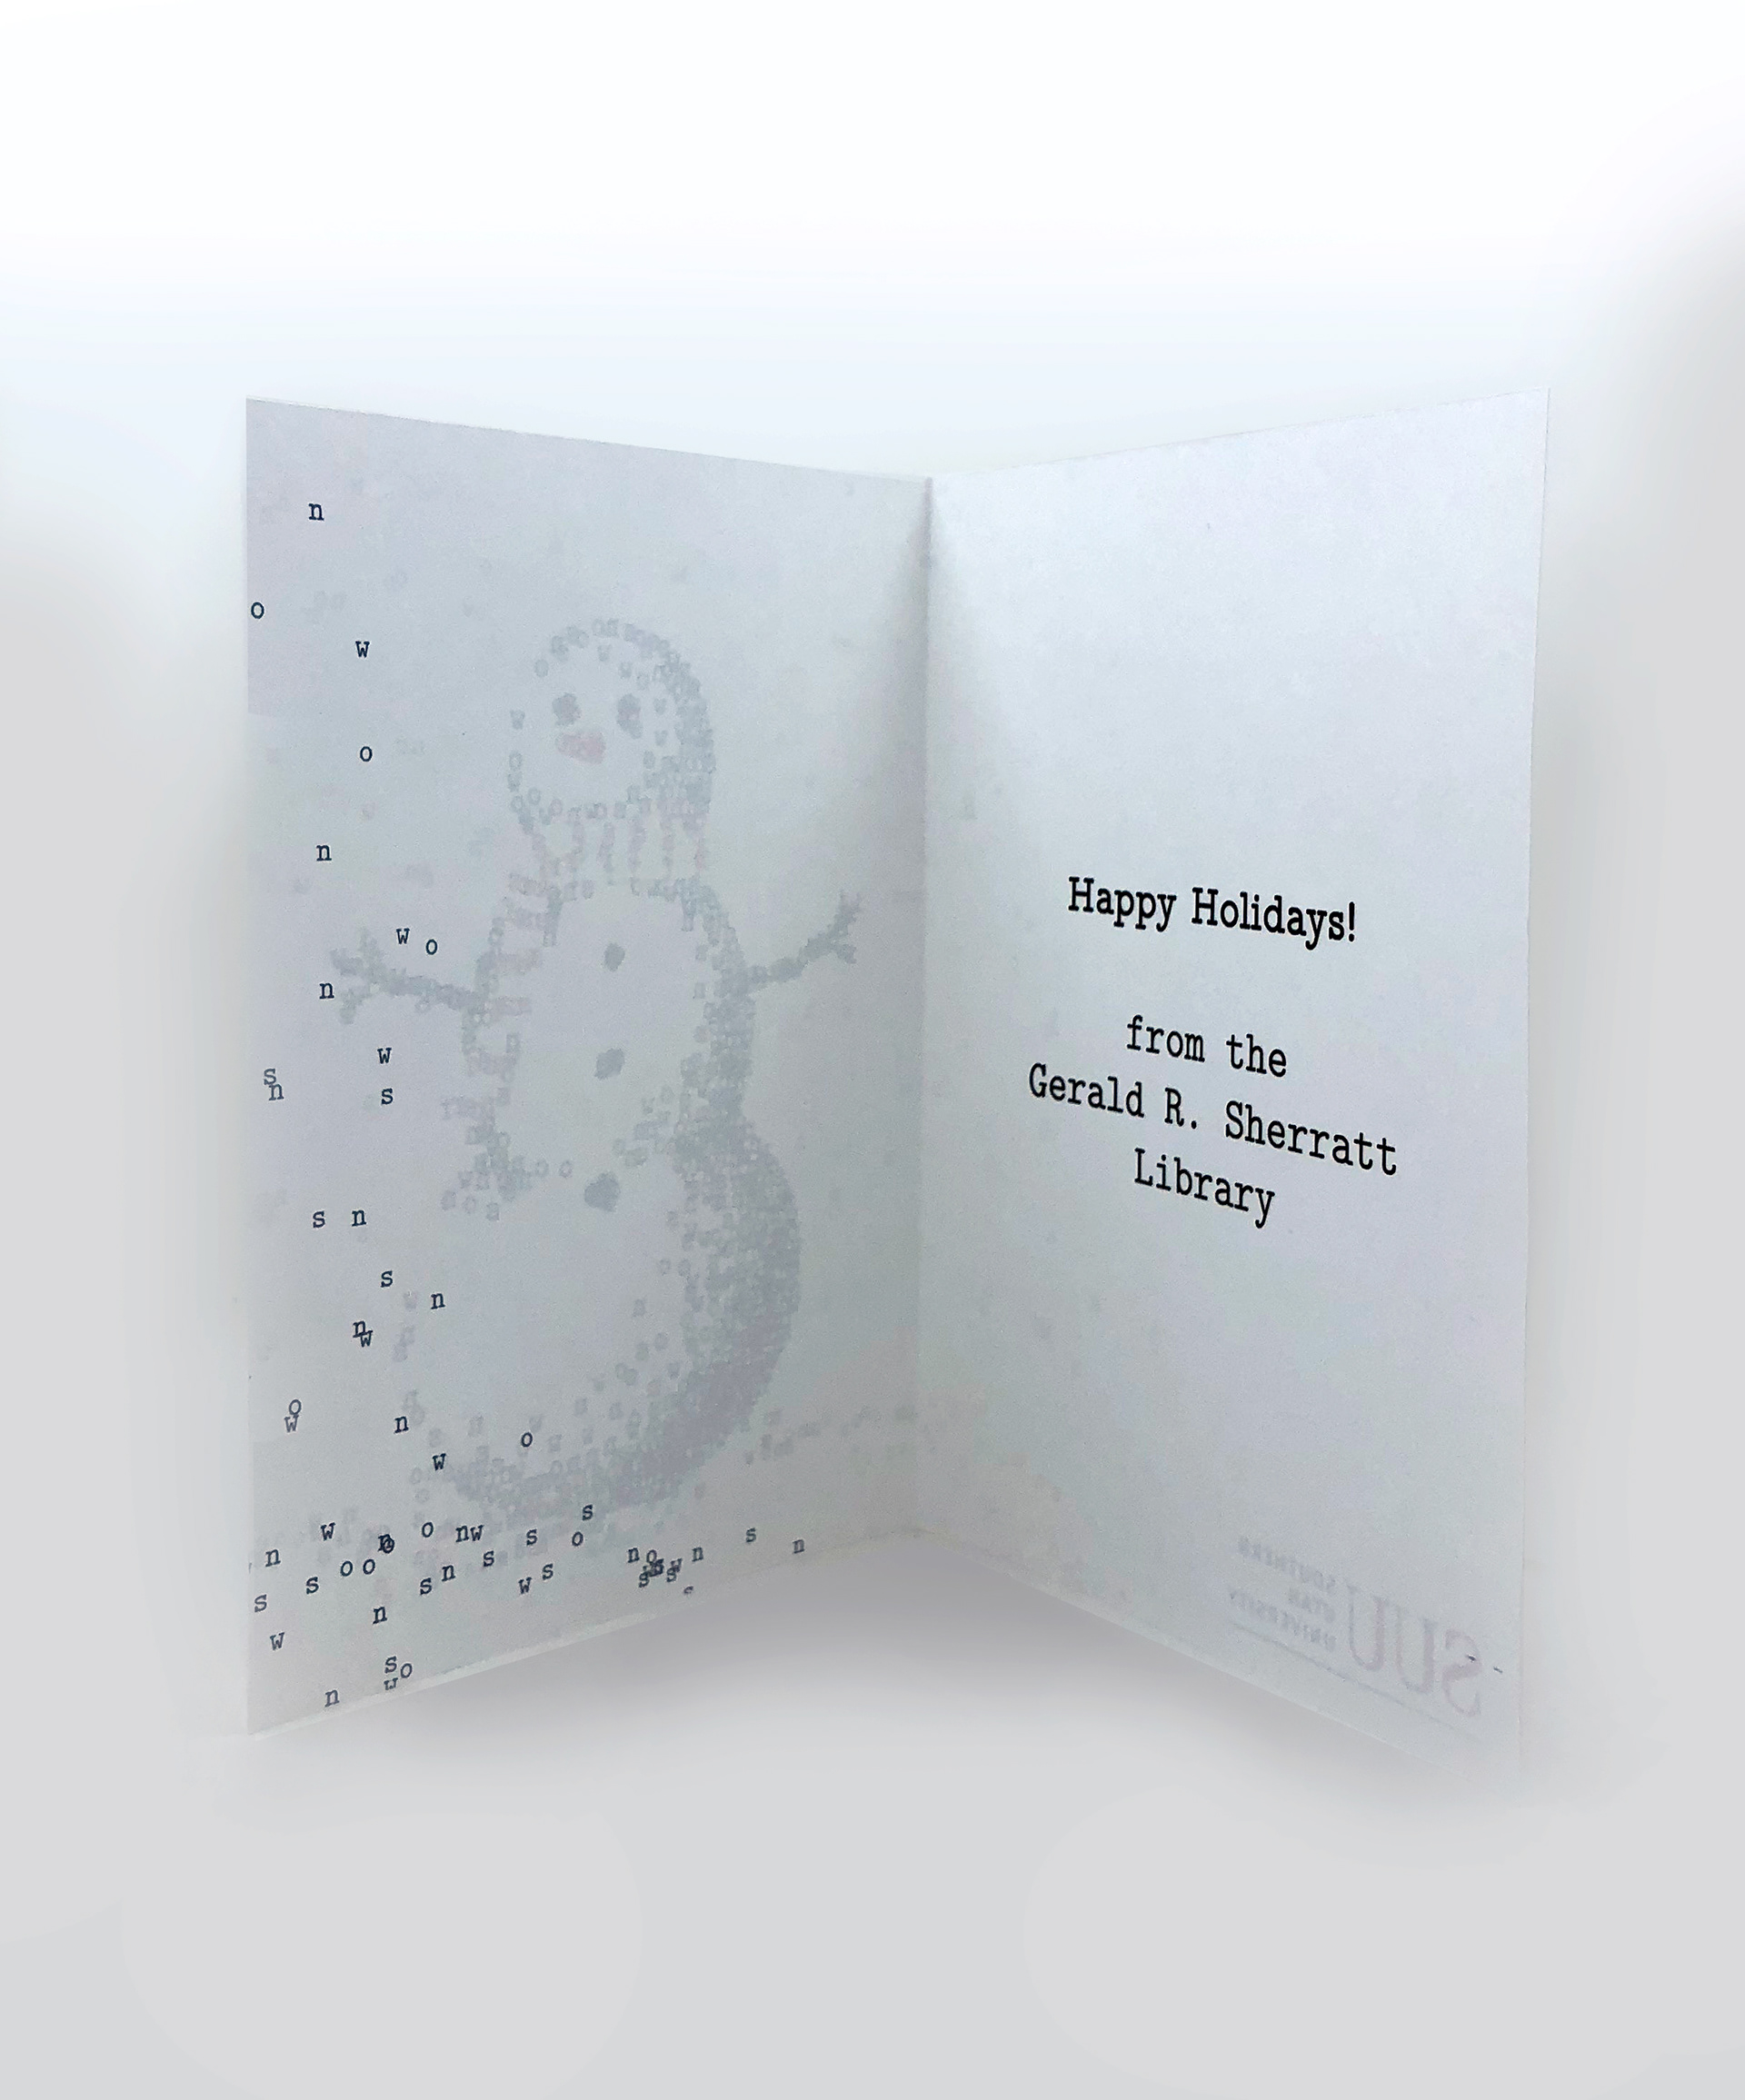 emma pickens christmas cards